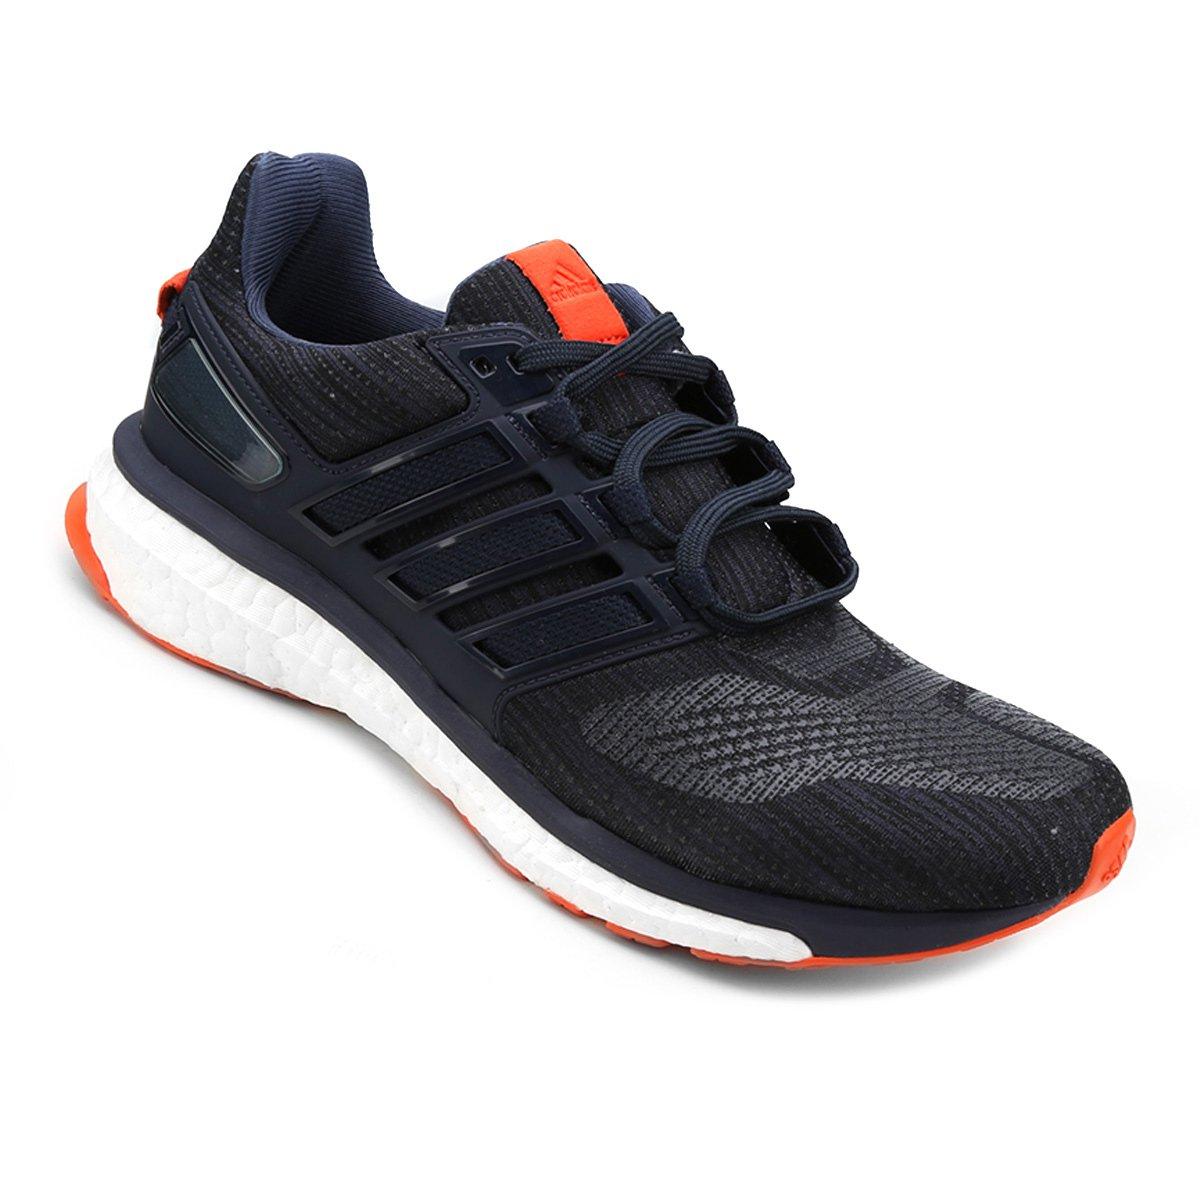 772a2fb70b15c ... where to buy tênis adidas energy boost 3 masculino laranjamarinho 7f44a  e756d